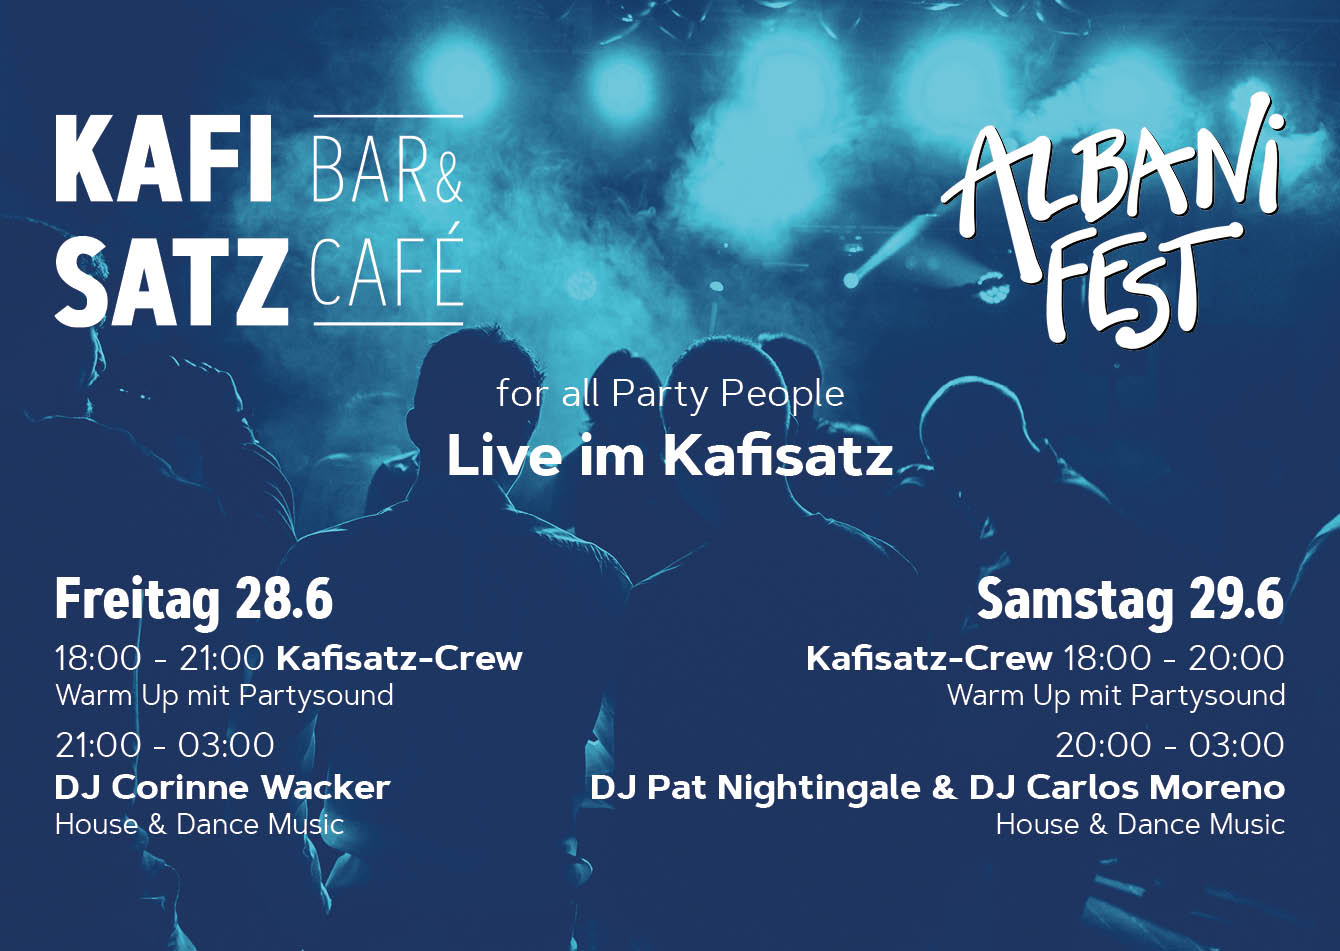 albanifest-2019_flyer